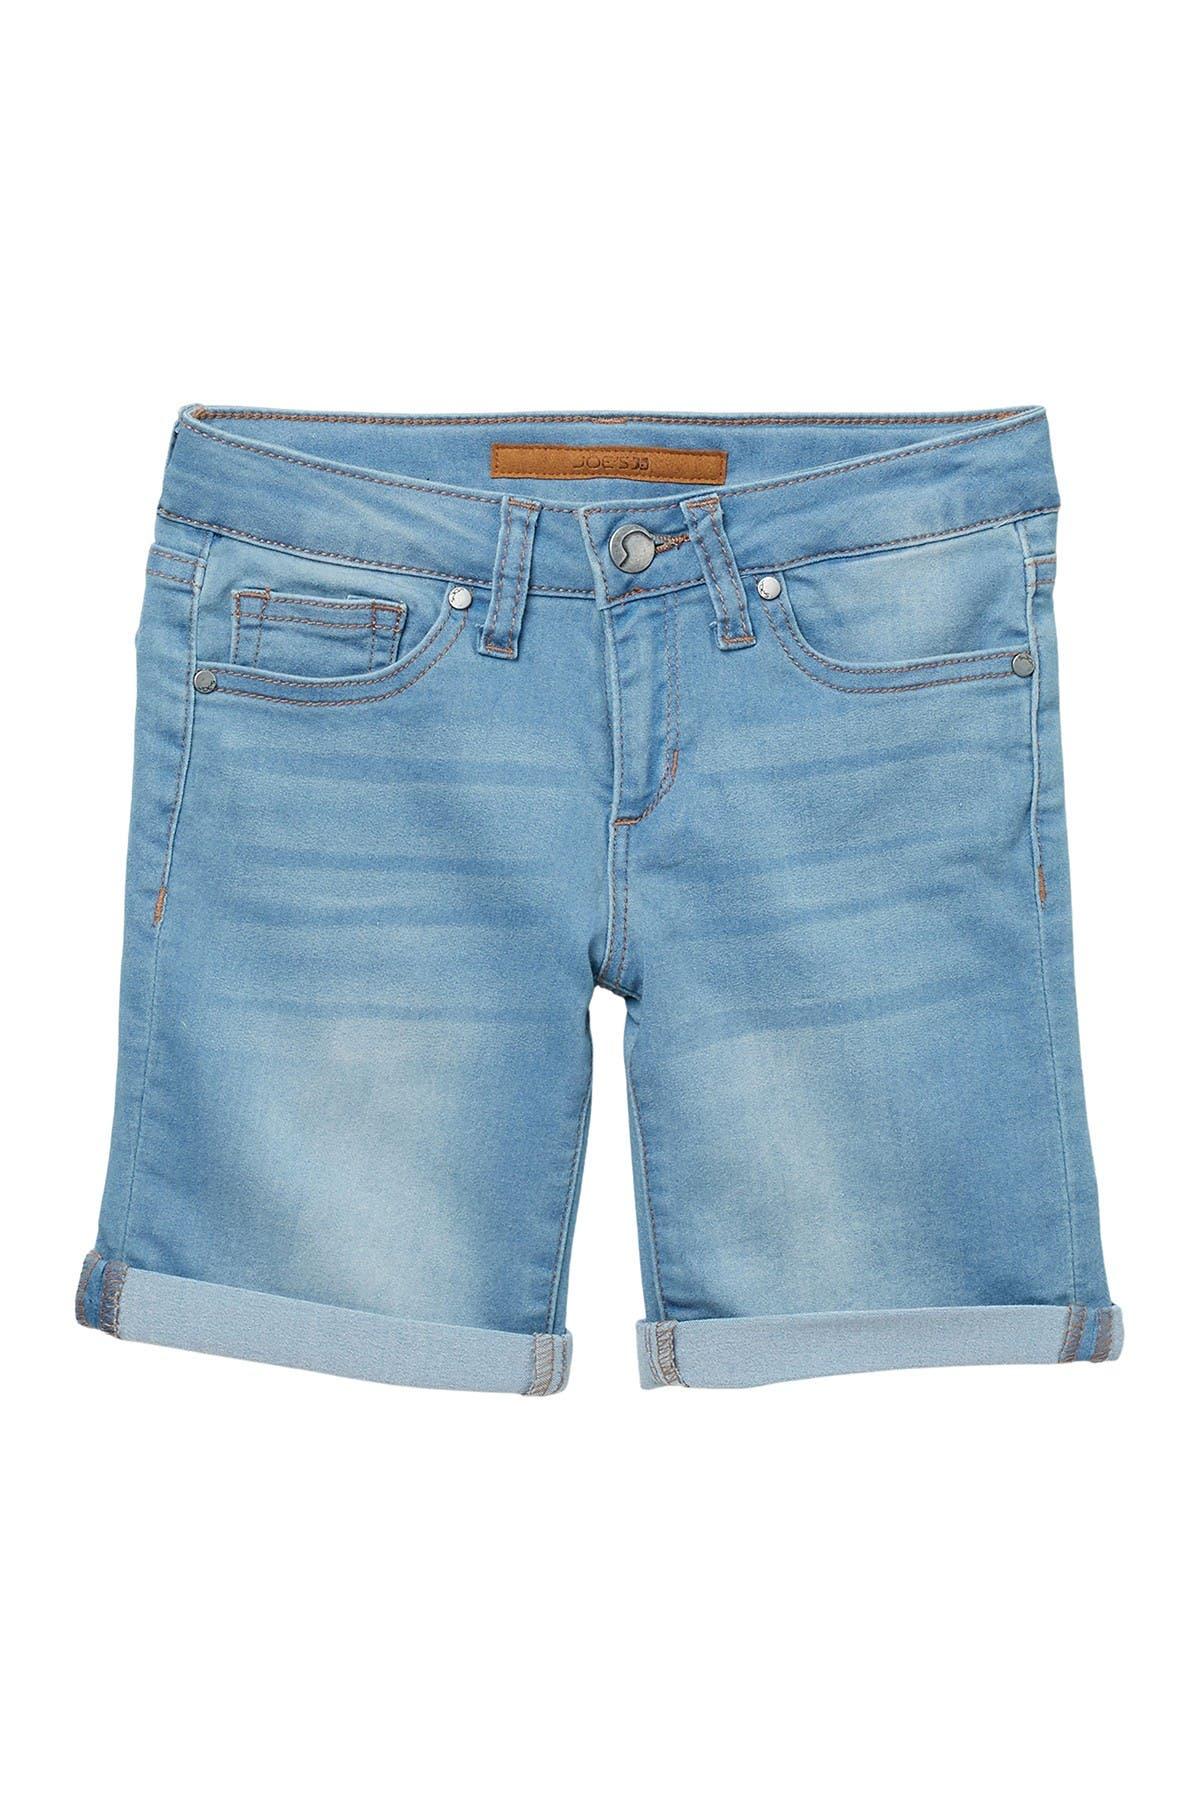 Image of Joe's Jeans Denim Bermuda Shorts